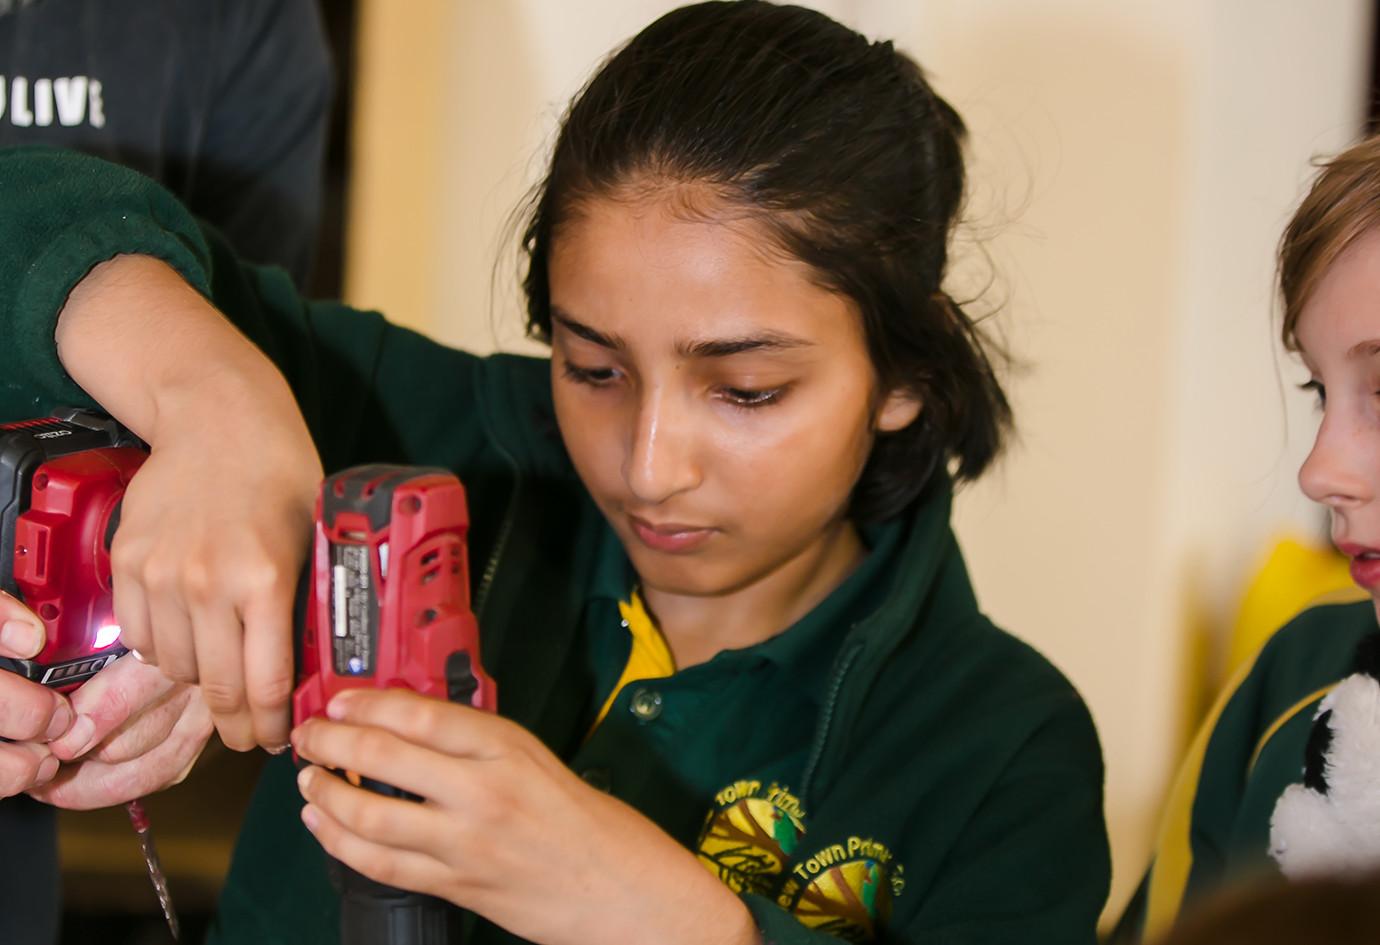 ReGenerate is girls using power tools (K